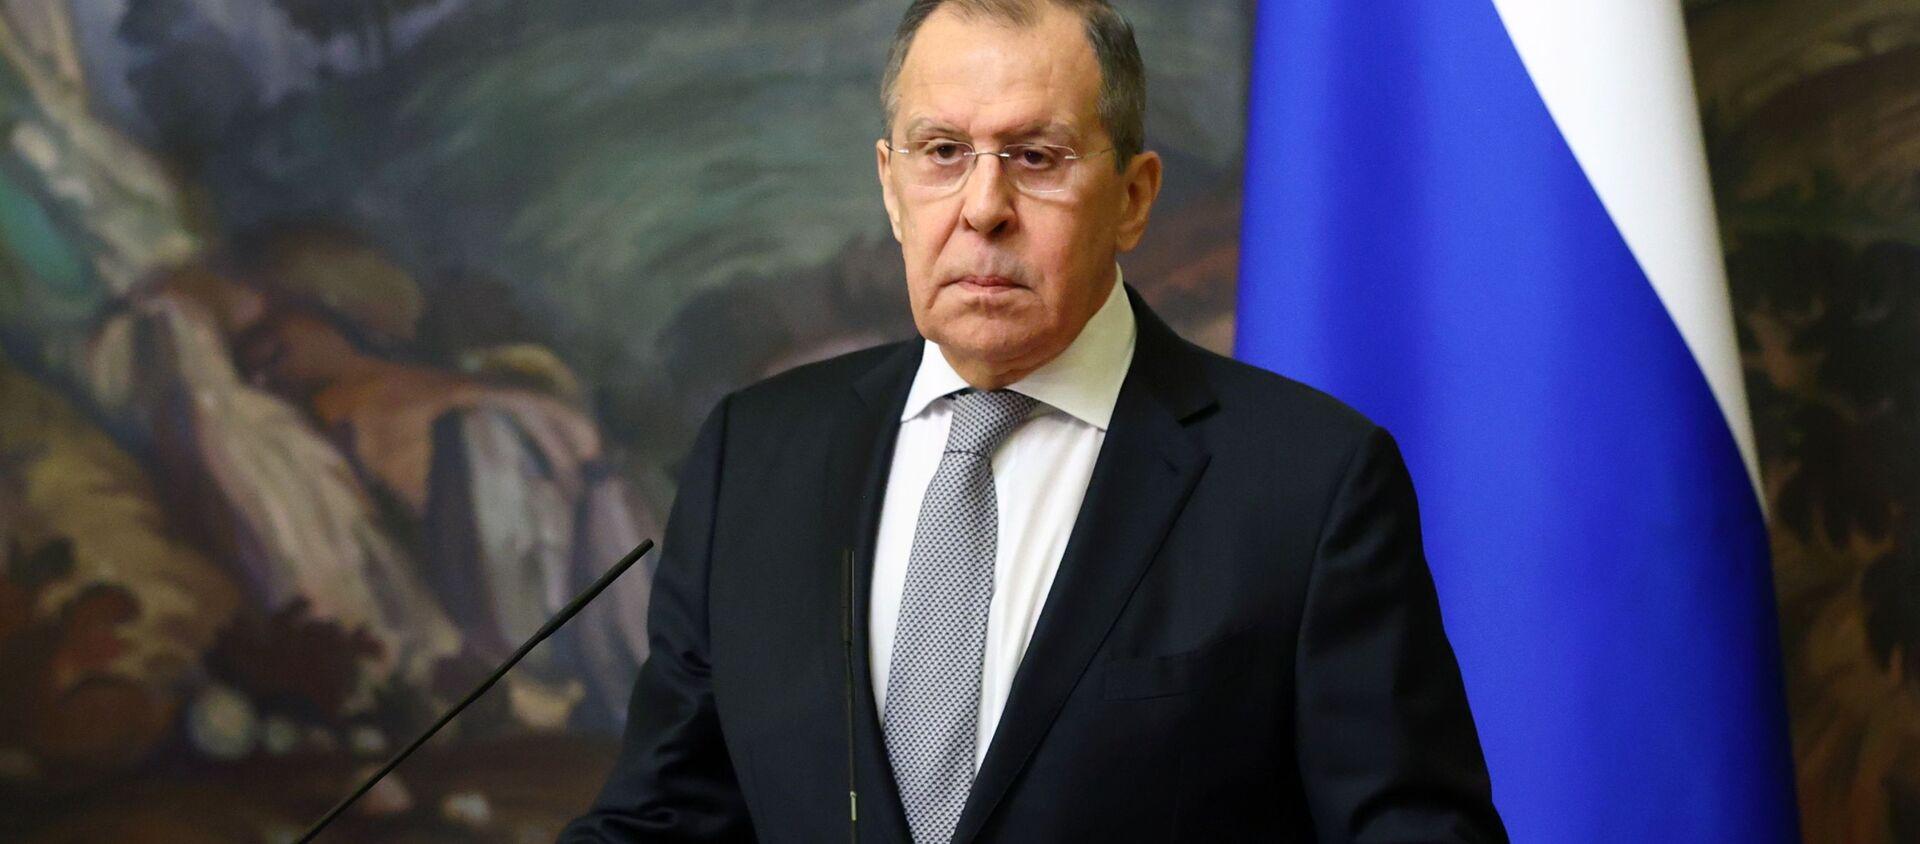 Russian Foreign Minister Sergey Lavrov  - Sputnik International, 1920, 28.04.2021